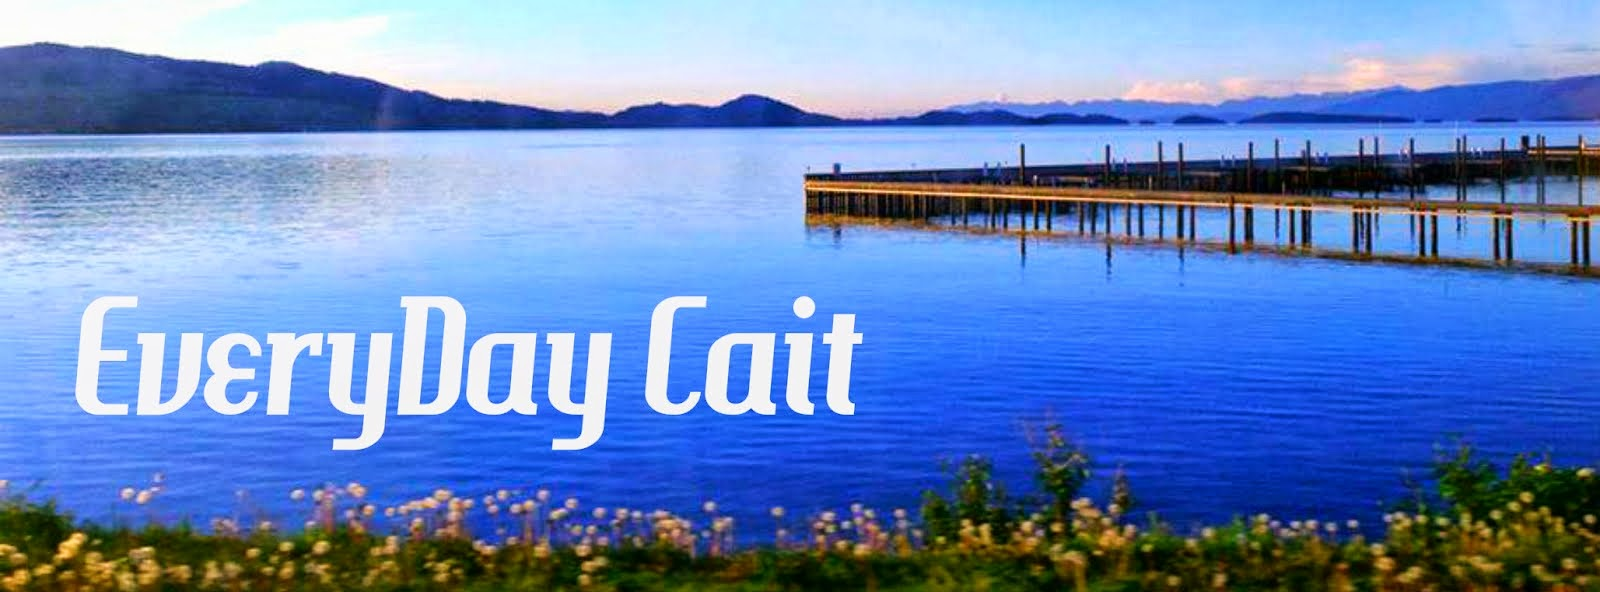 Cait's Blog!